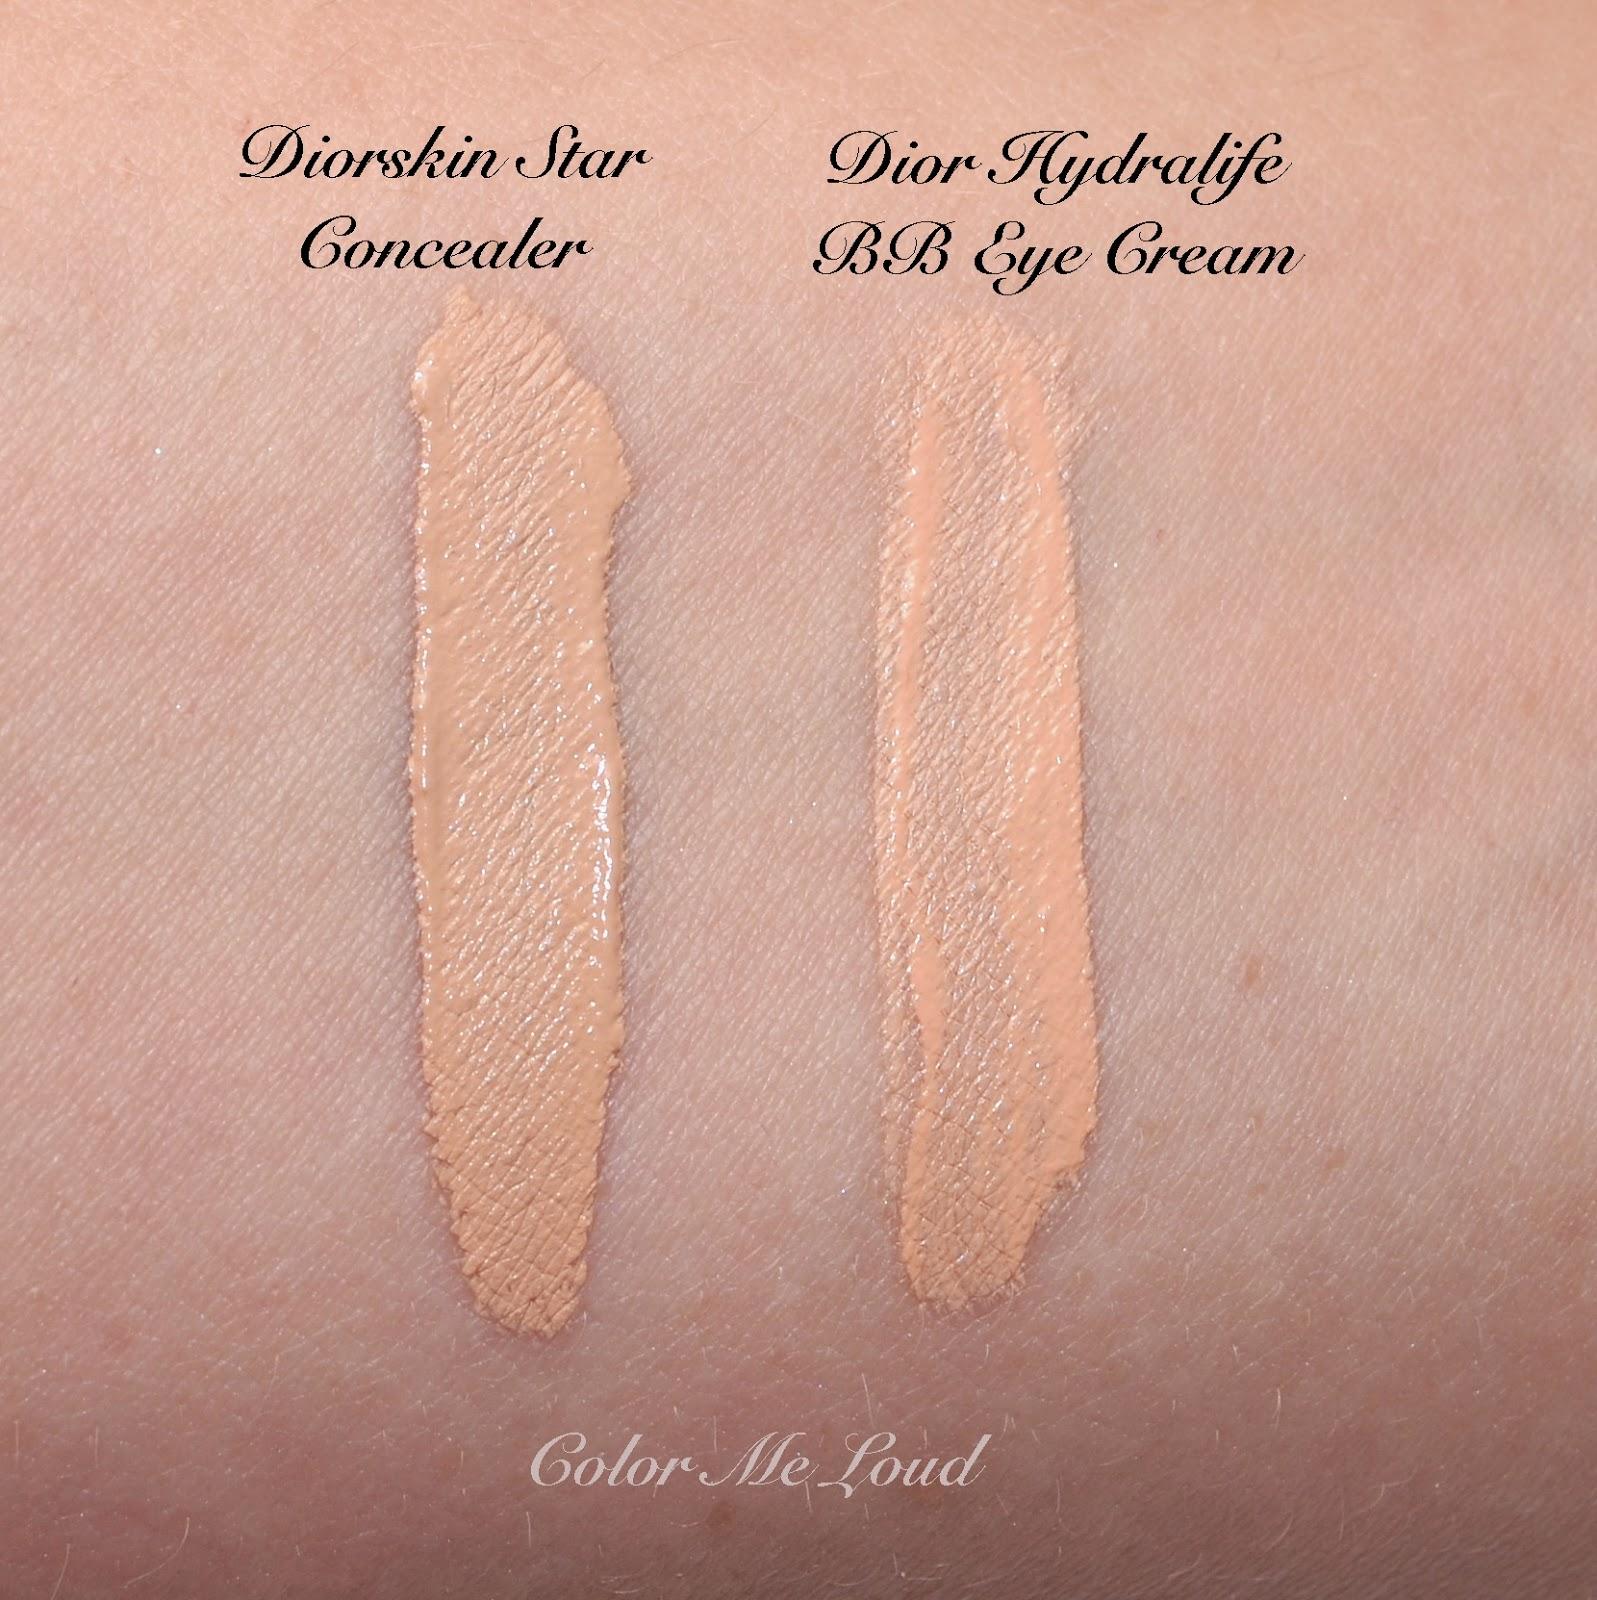 Skin Nude Concealer by Dior #5